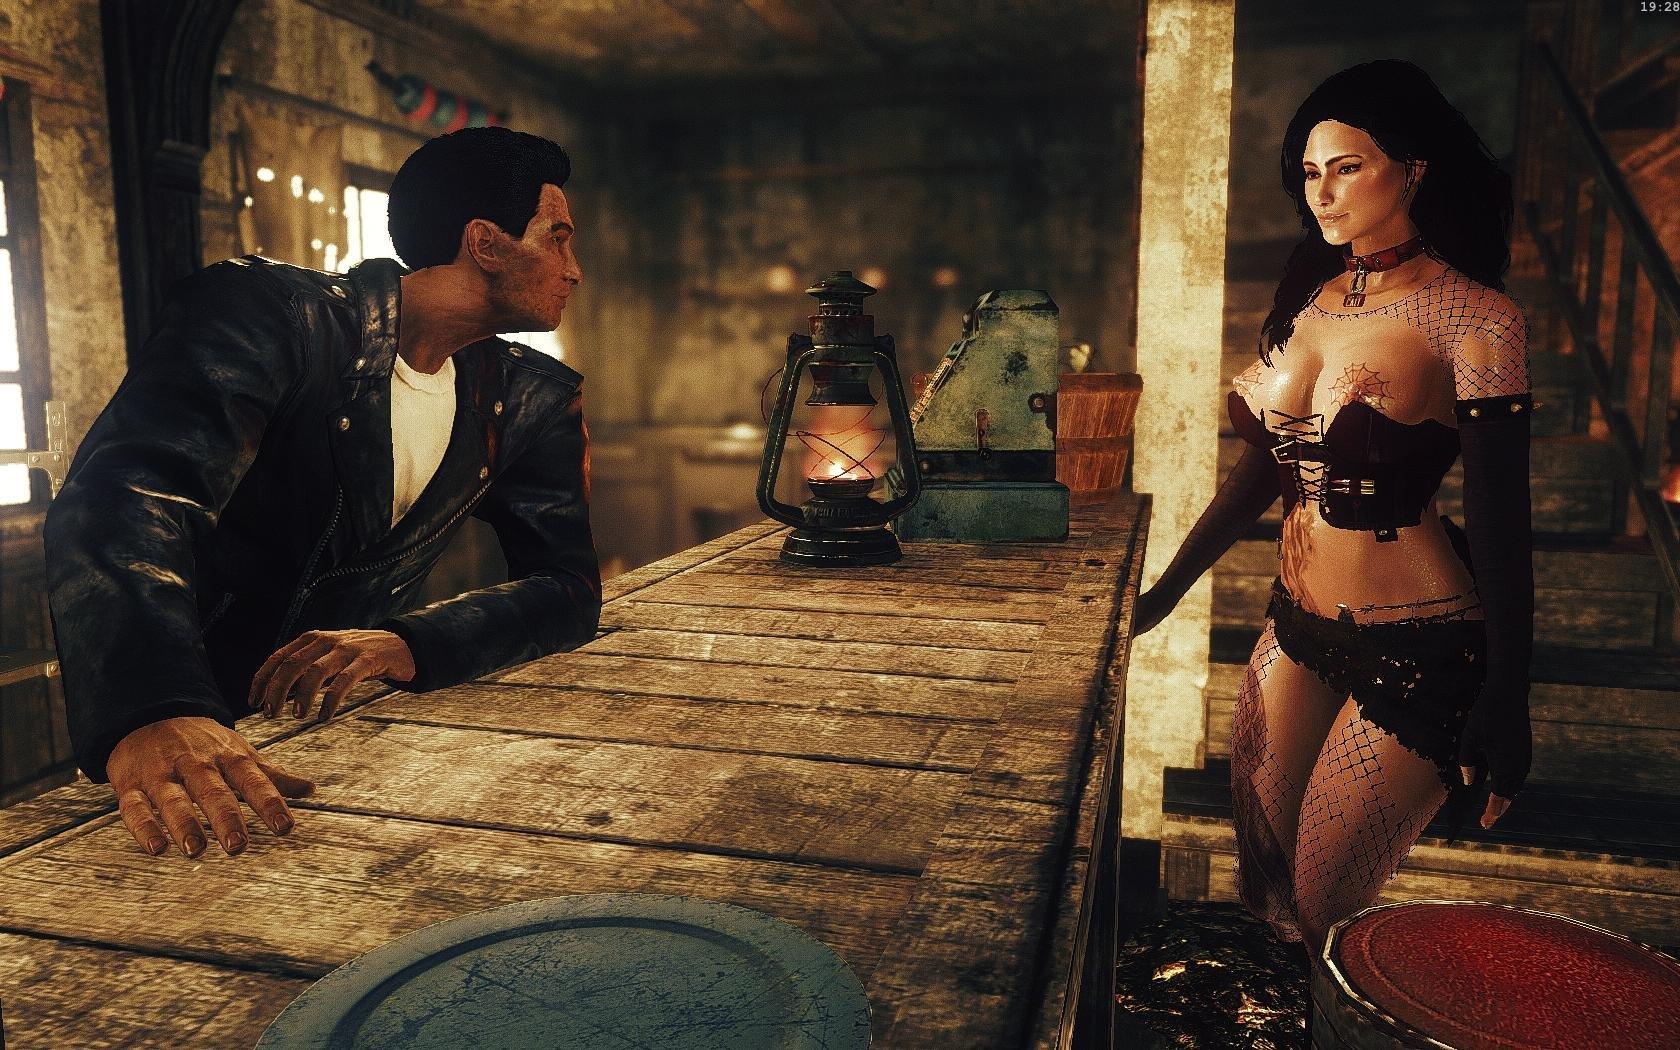 Fallout4 2019-05-30 19-28-31-95